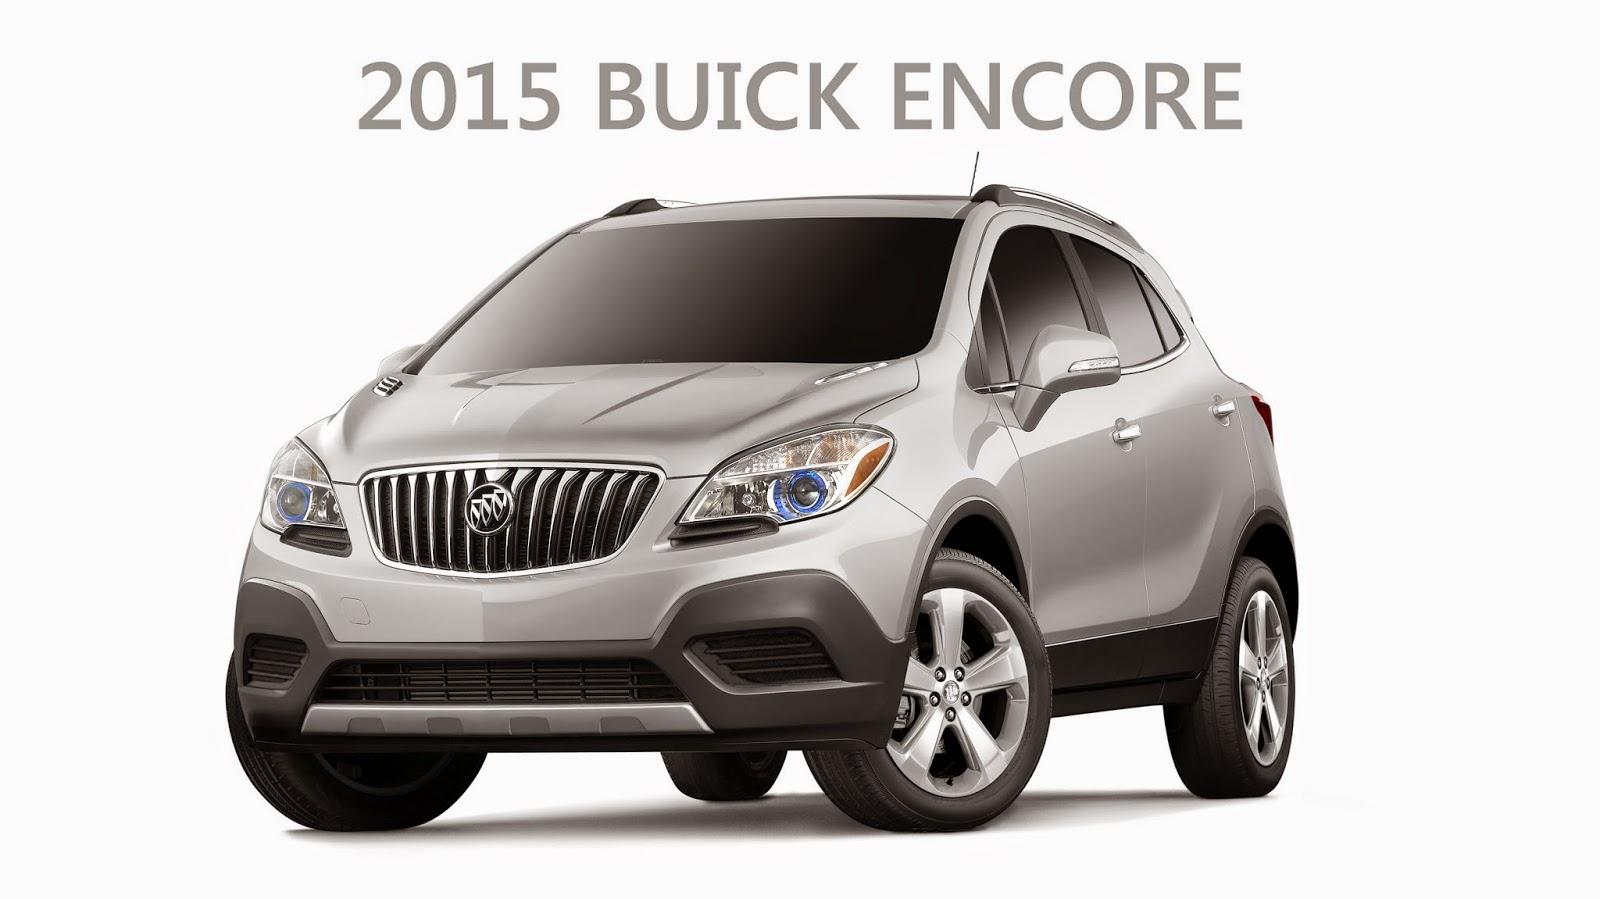 http://www.fergusonbuickgmc.com/2015-Buick-Encore